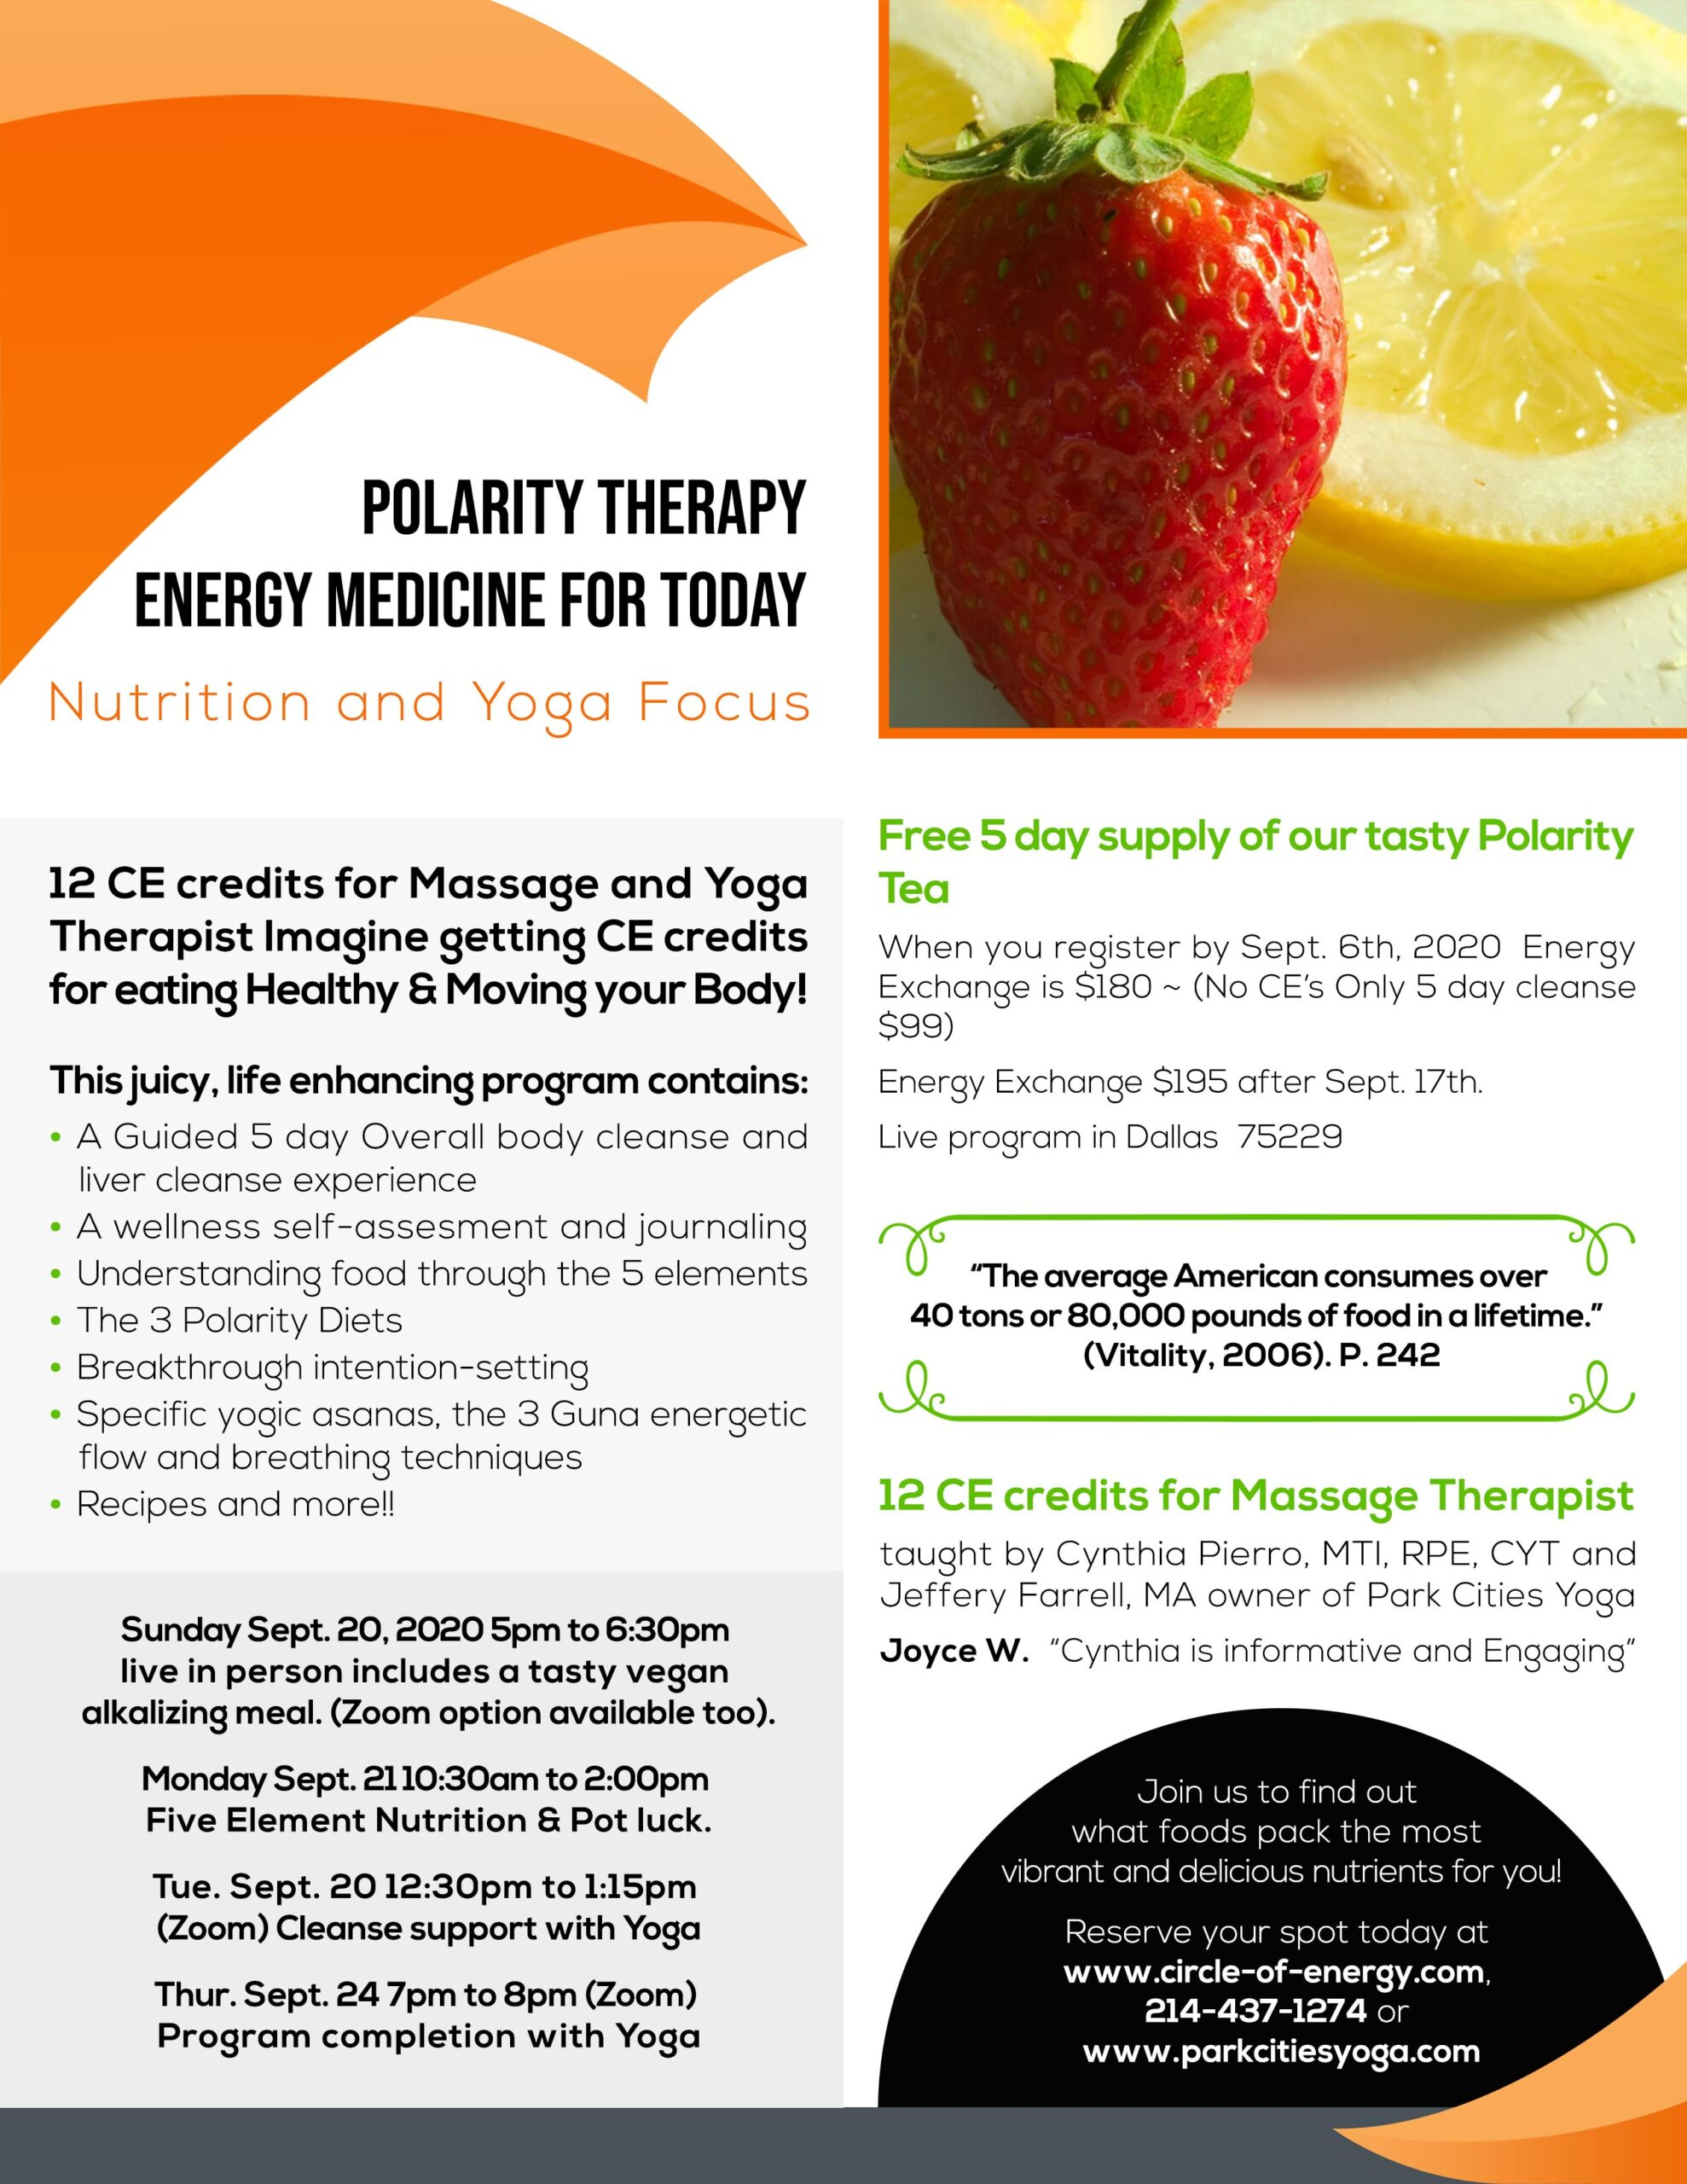 Polarity Therapy Energy Medicine